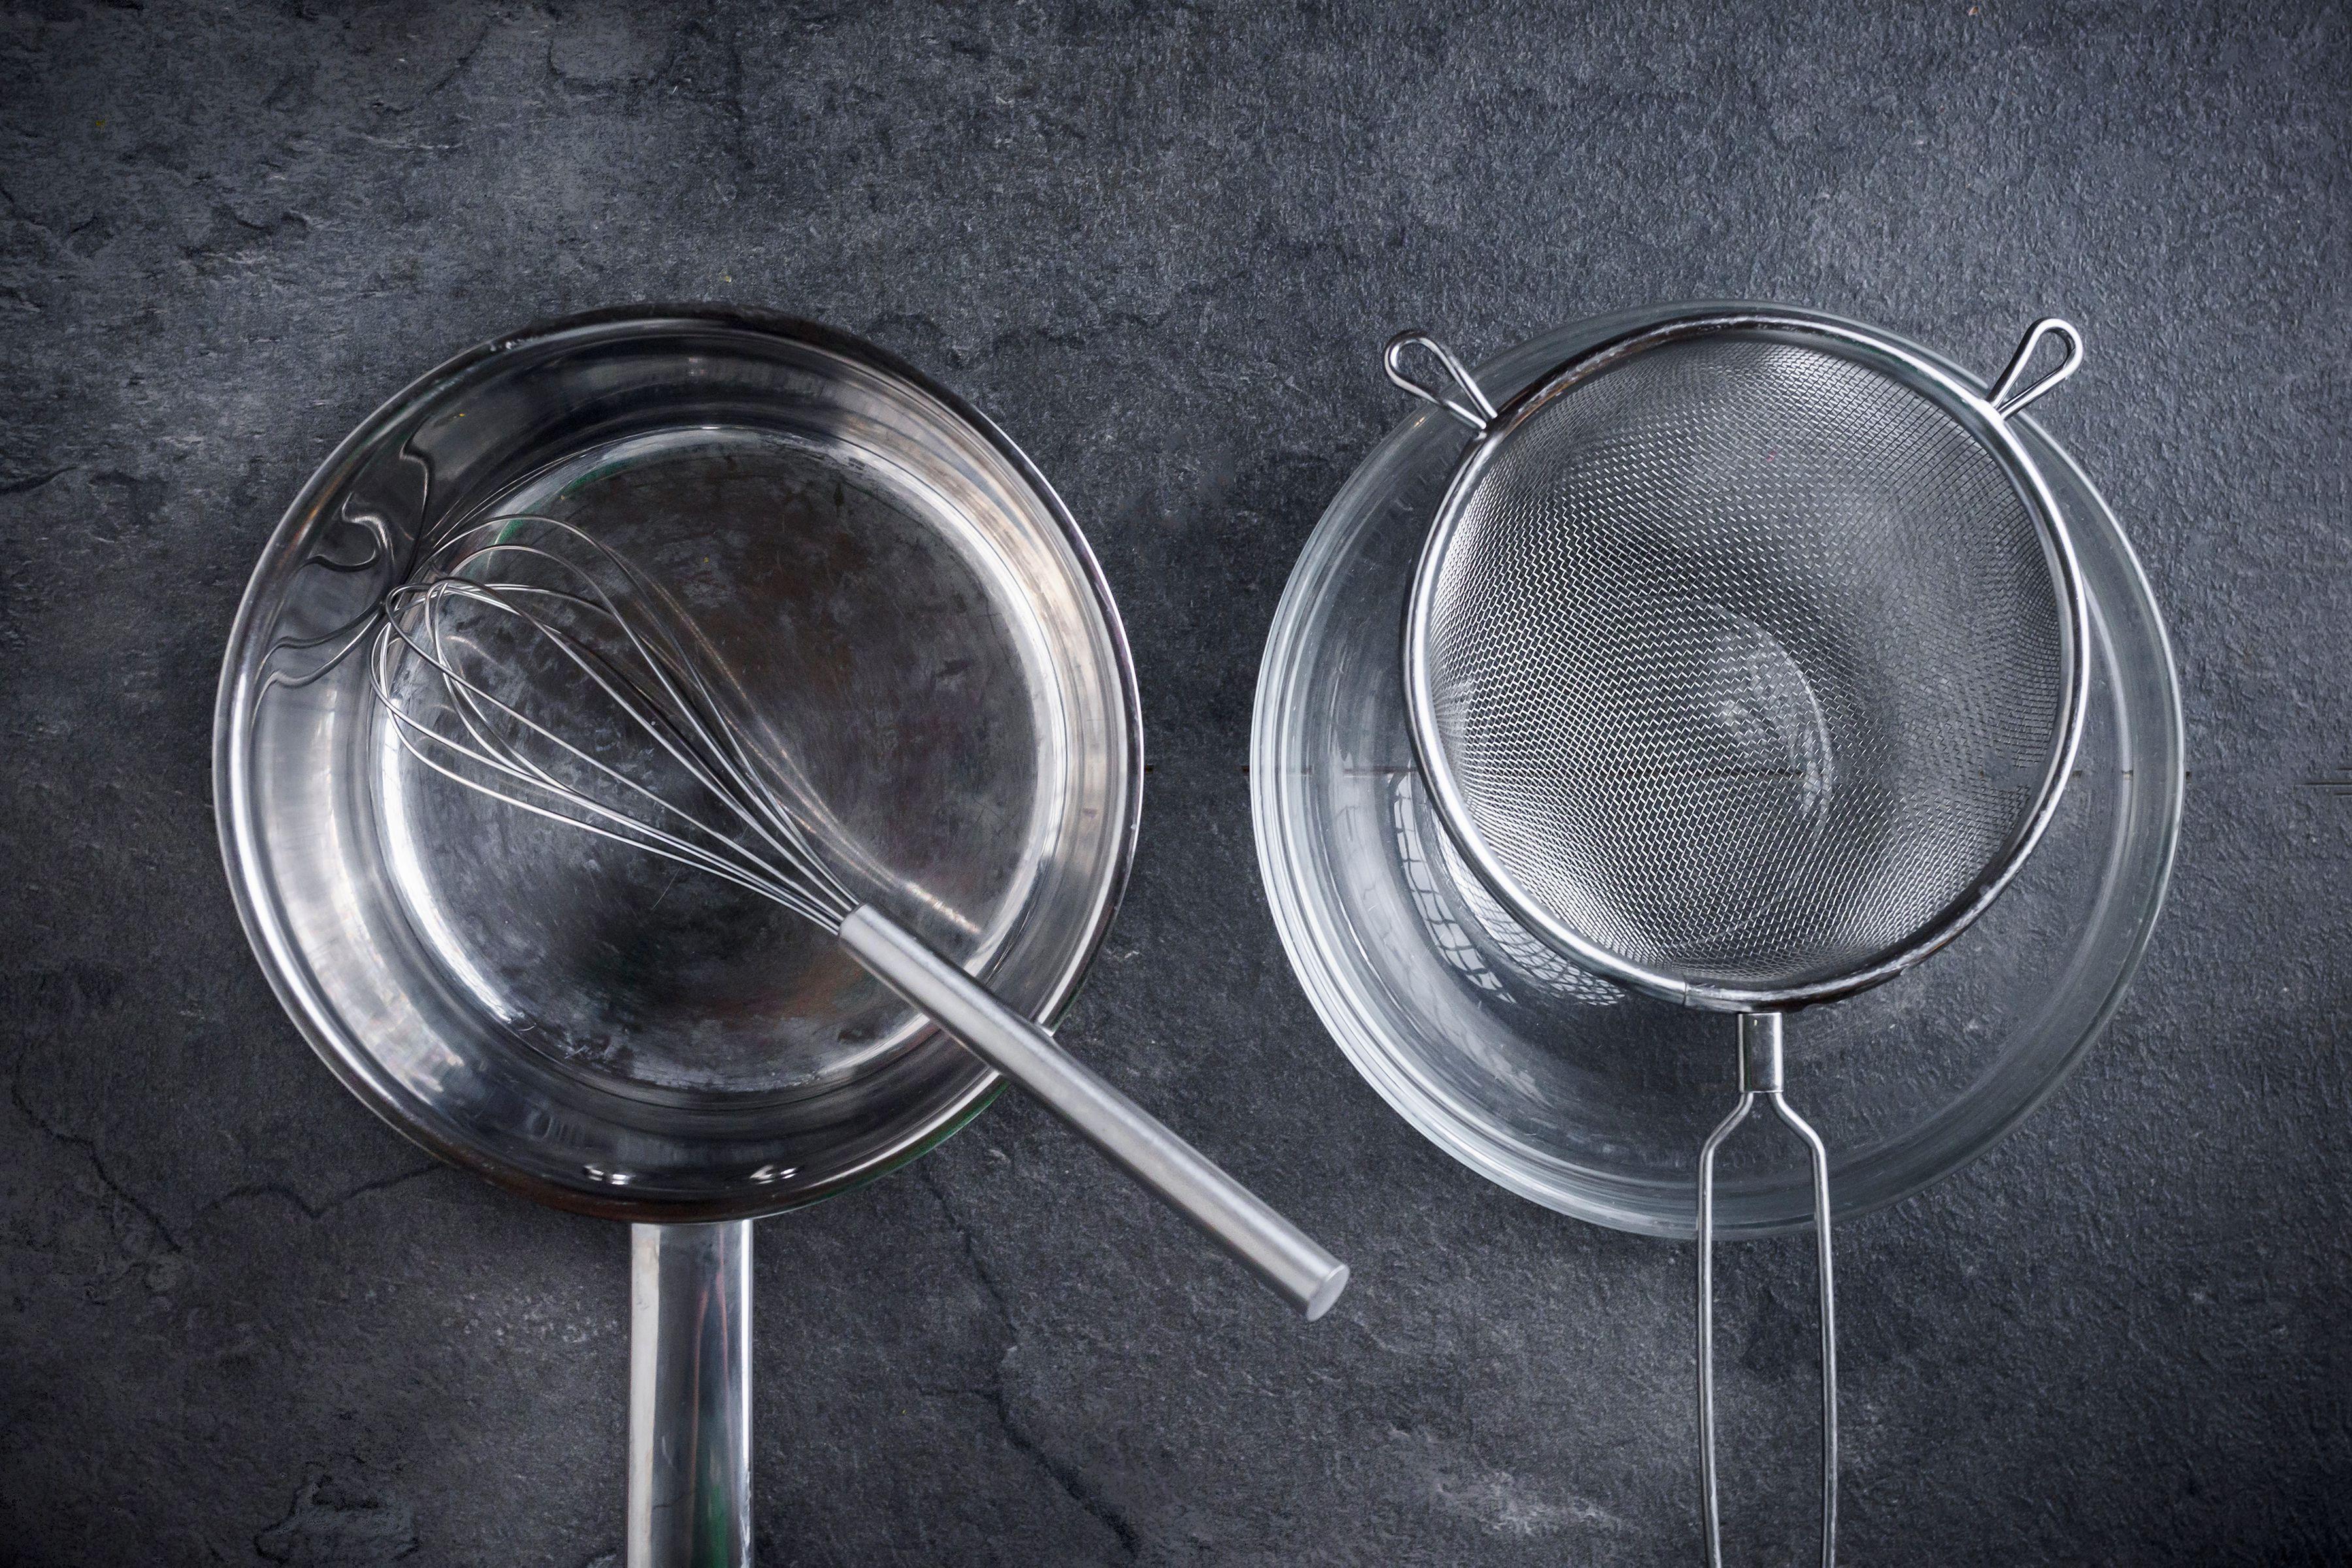 Saute pan, strainer, bowl